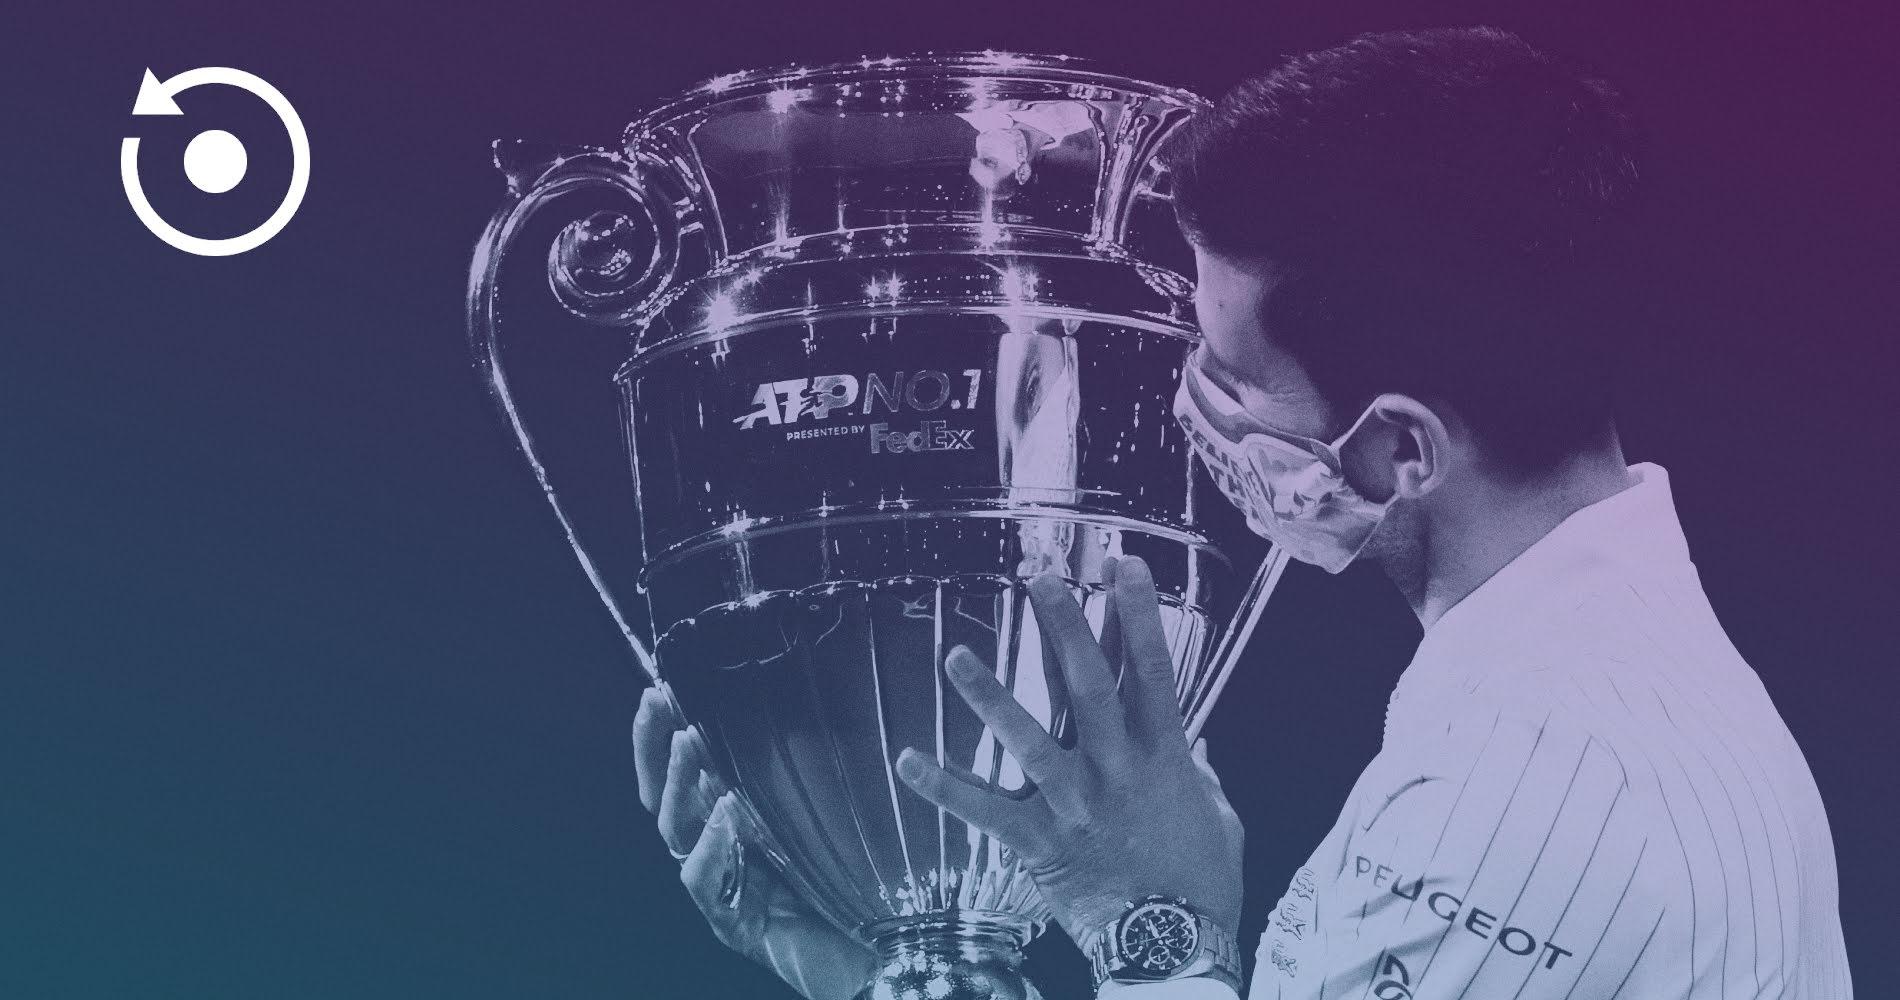 2020 recap: Novak Djokovic